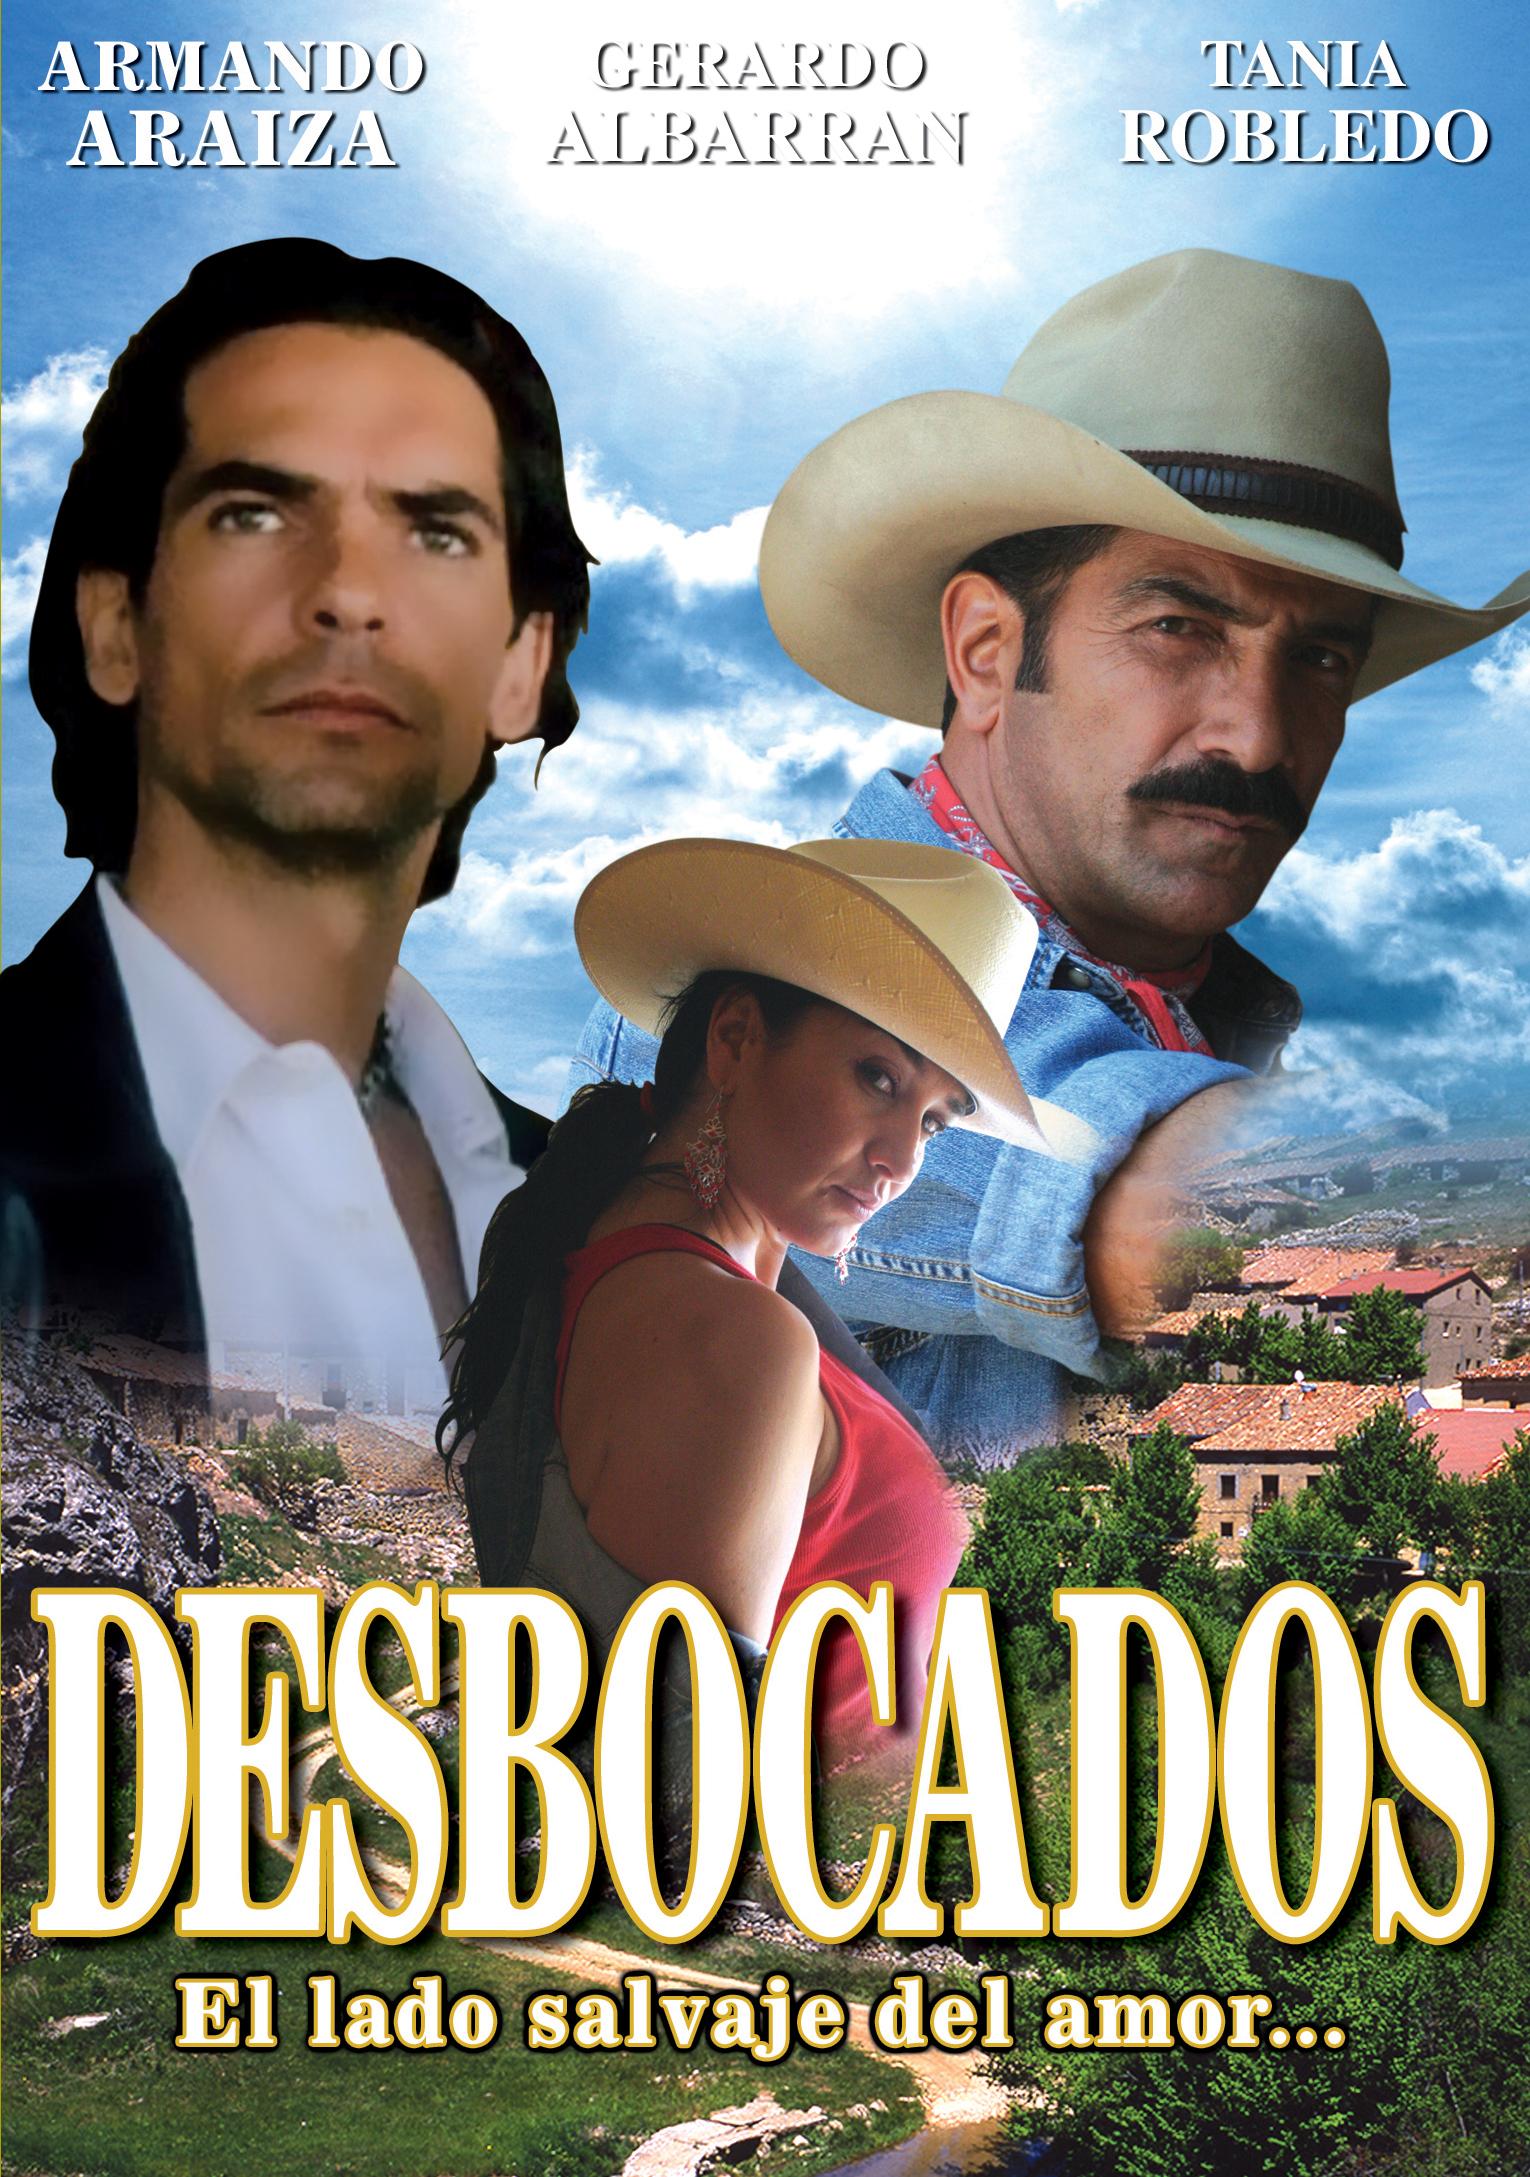 Desbocados (2008)